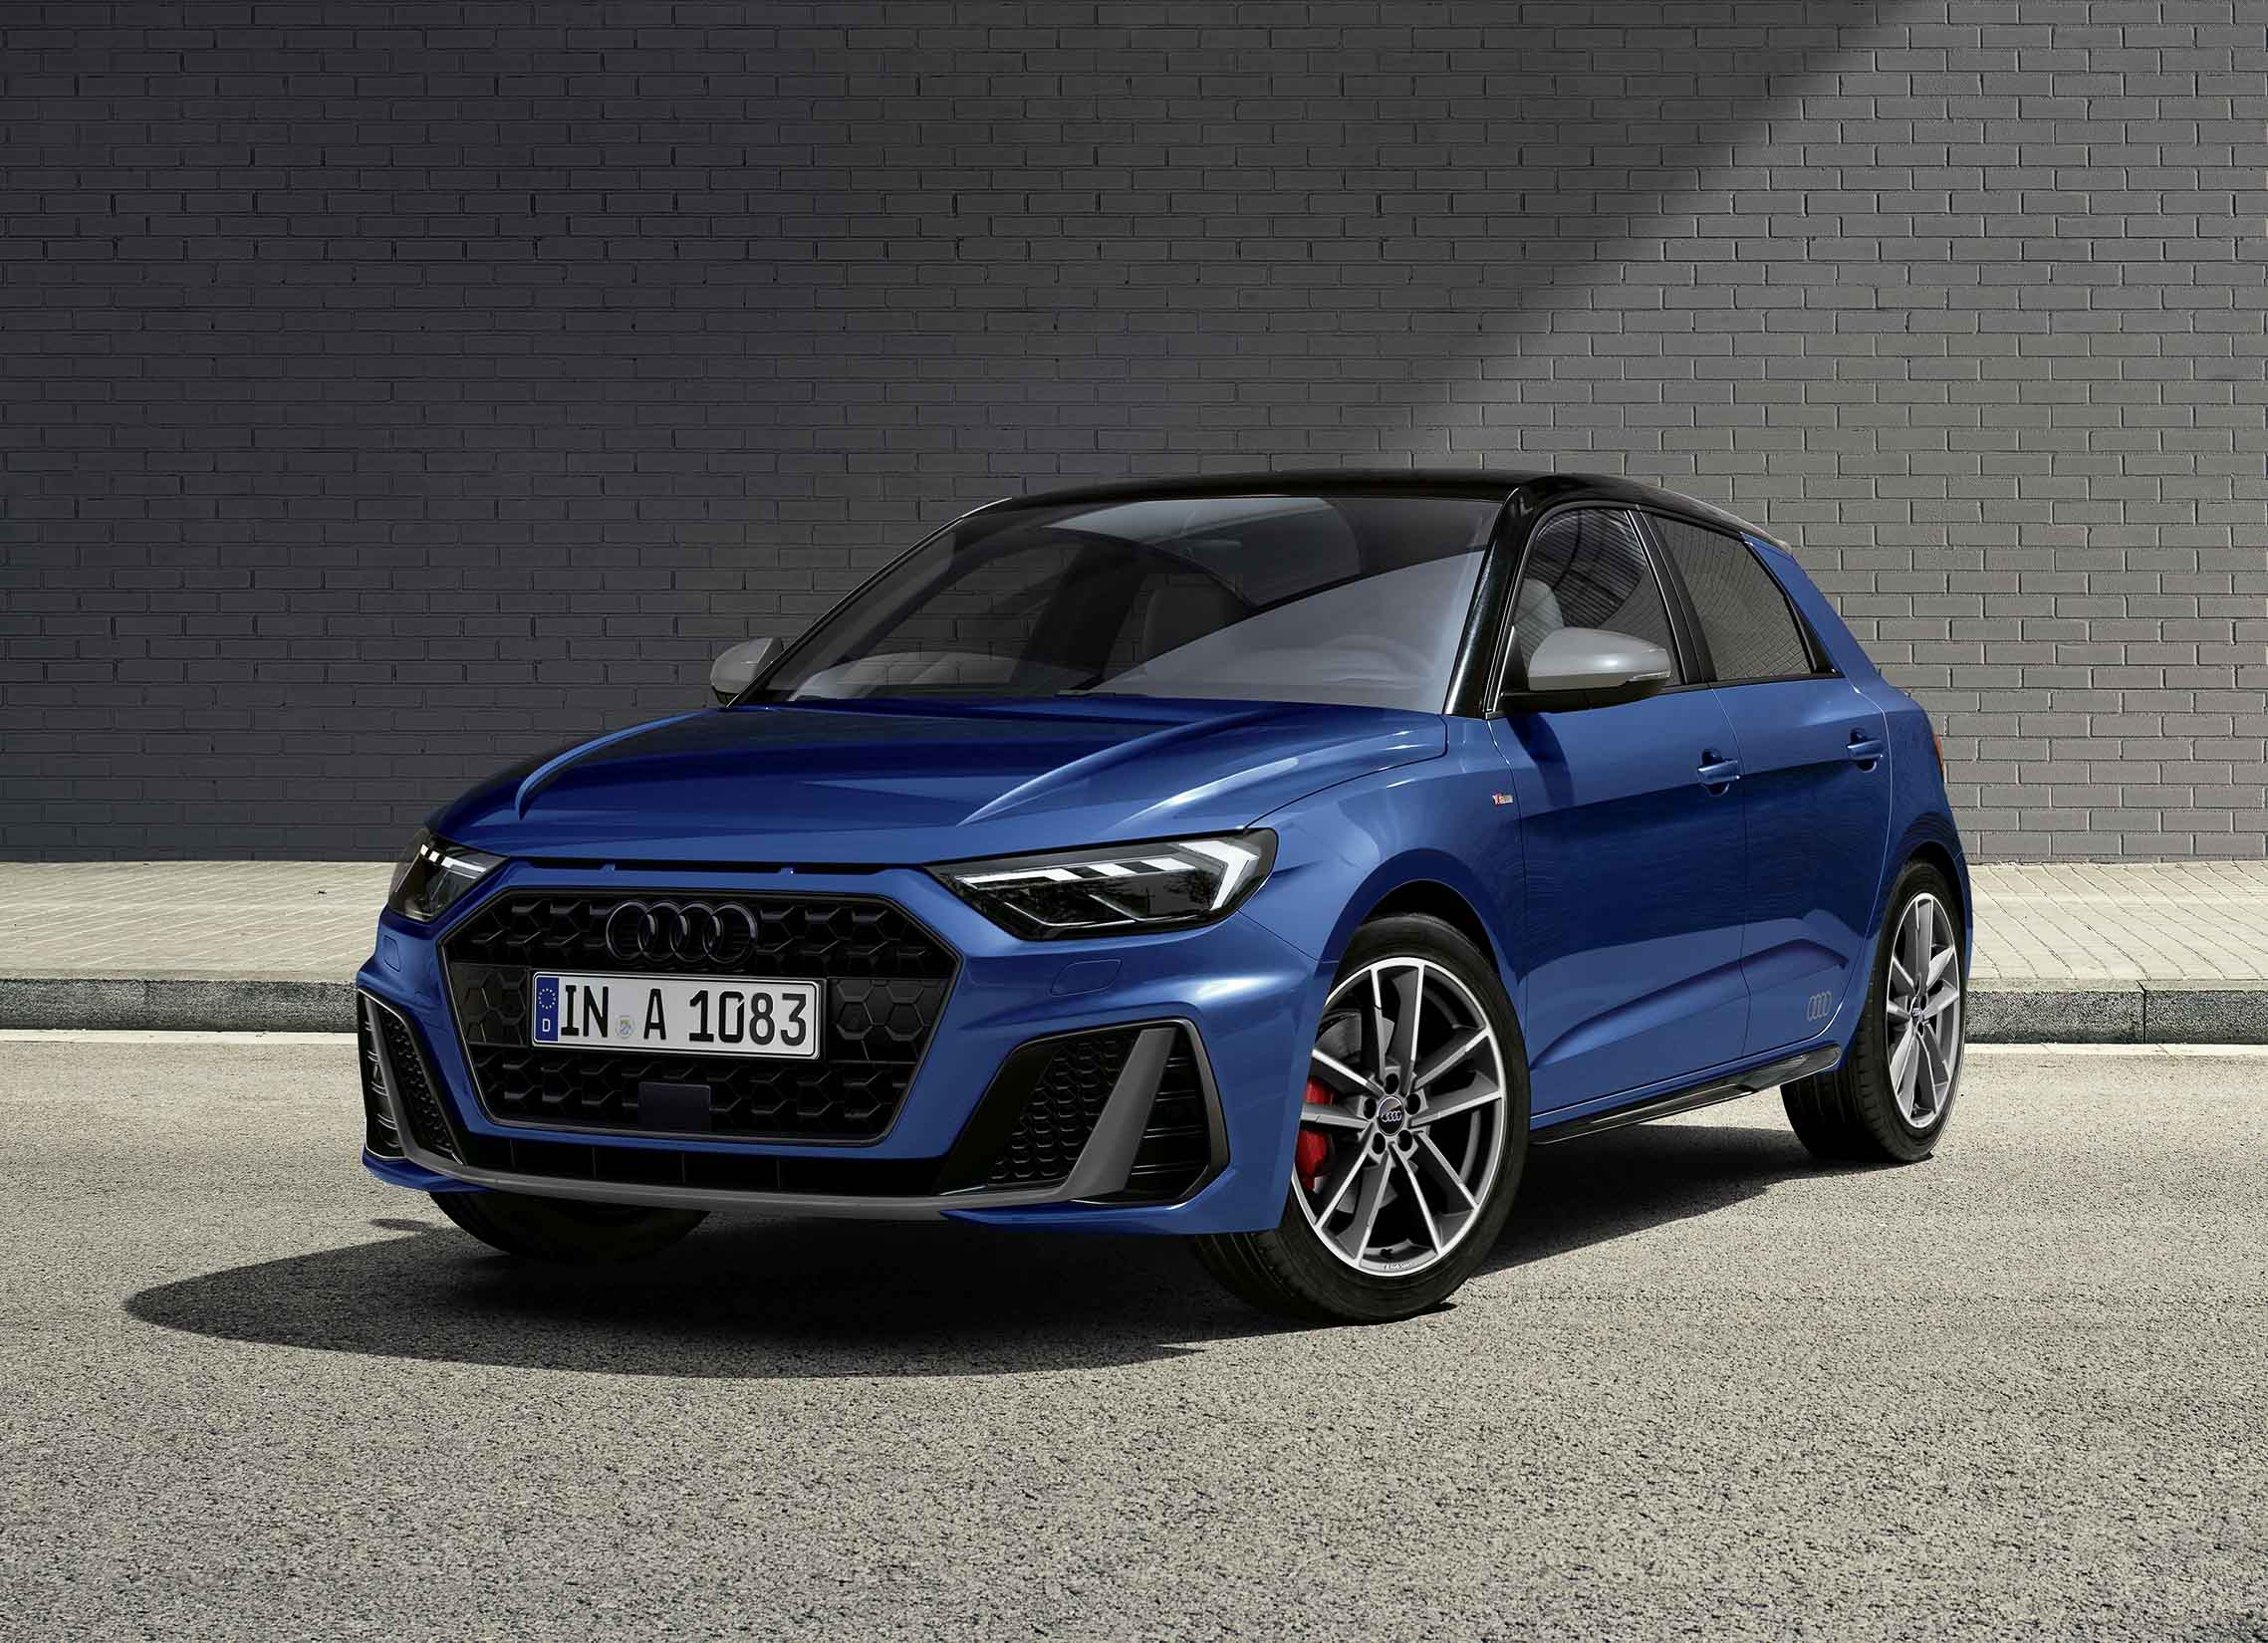 2021 Audi A1 Sportback S line competition - ascariblau   Fanaticar Magazin